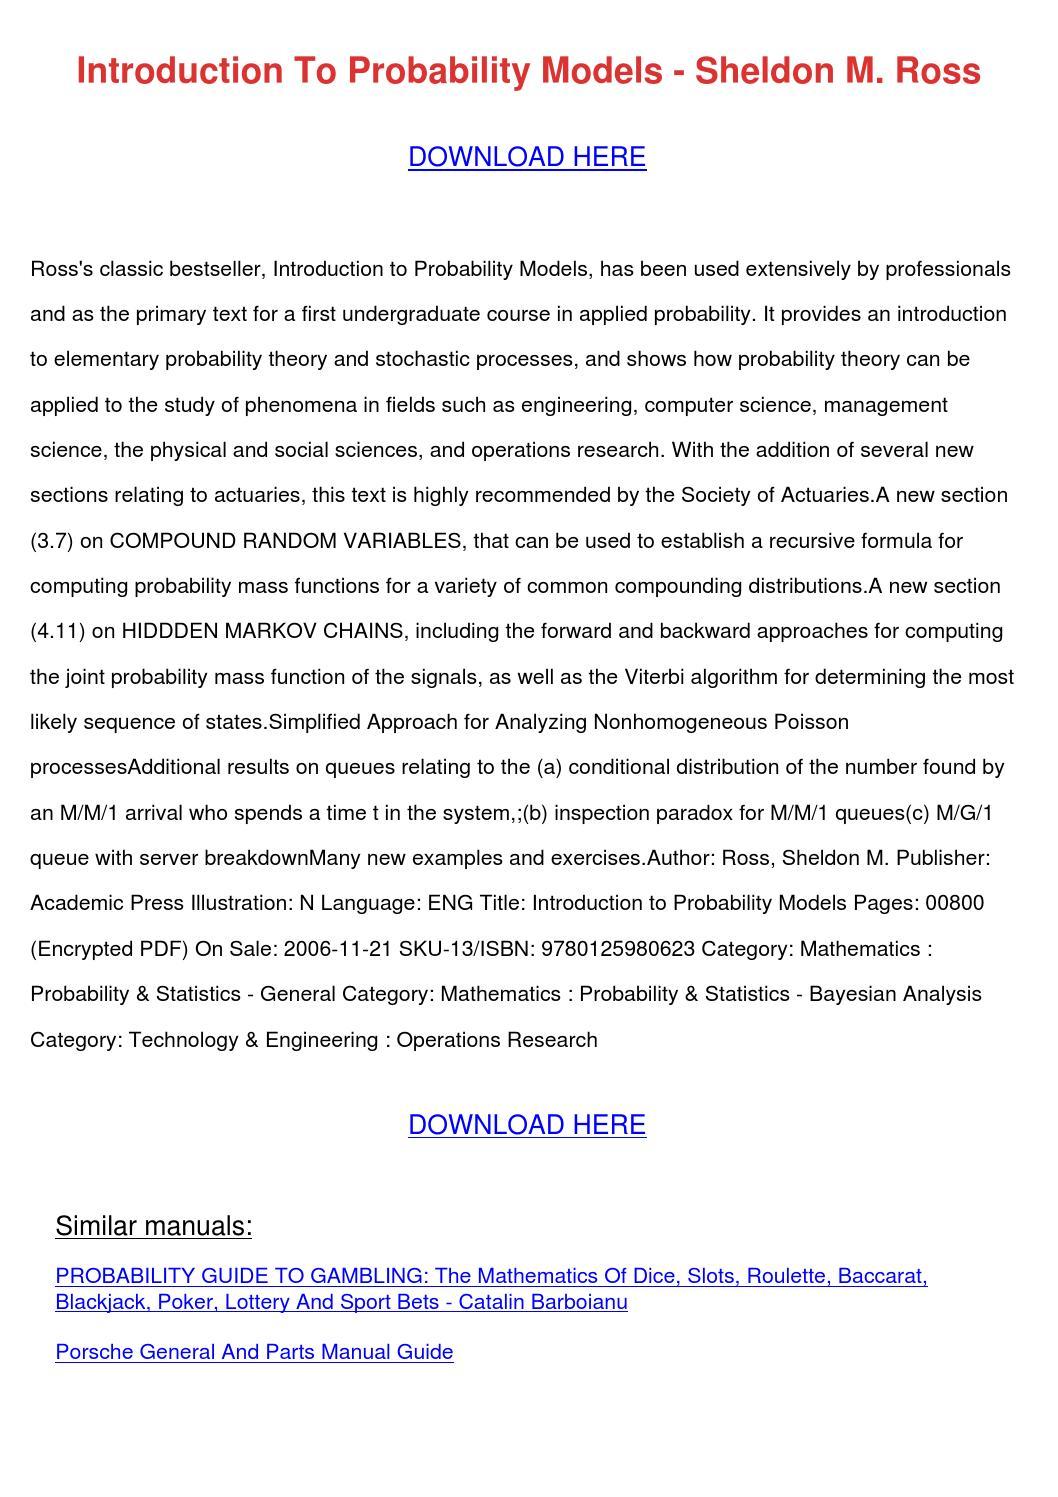 Introduction To Probability Models Sheldon M by KayleeIbarra - issuu